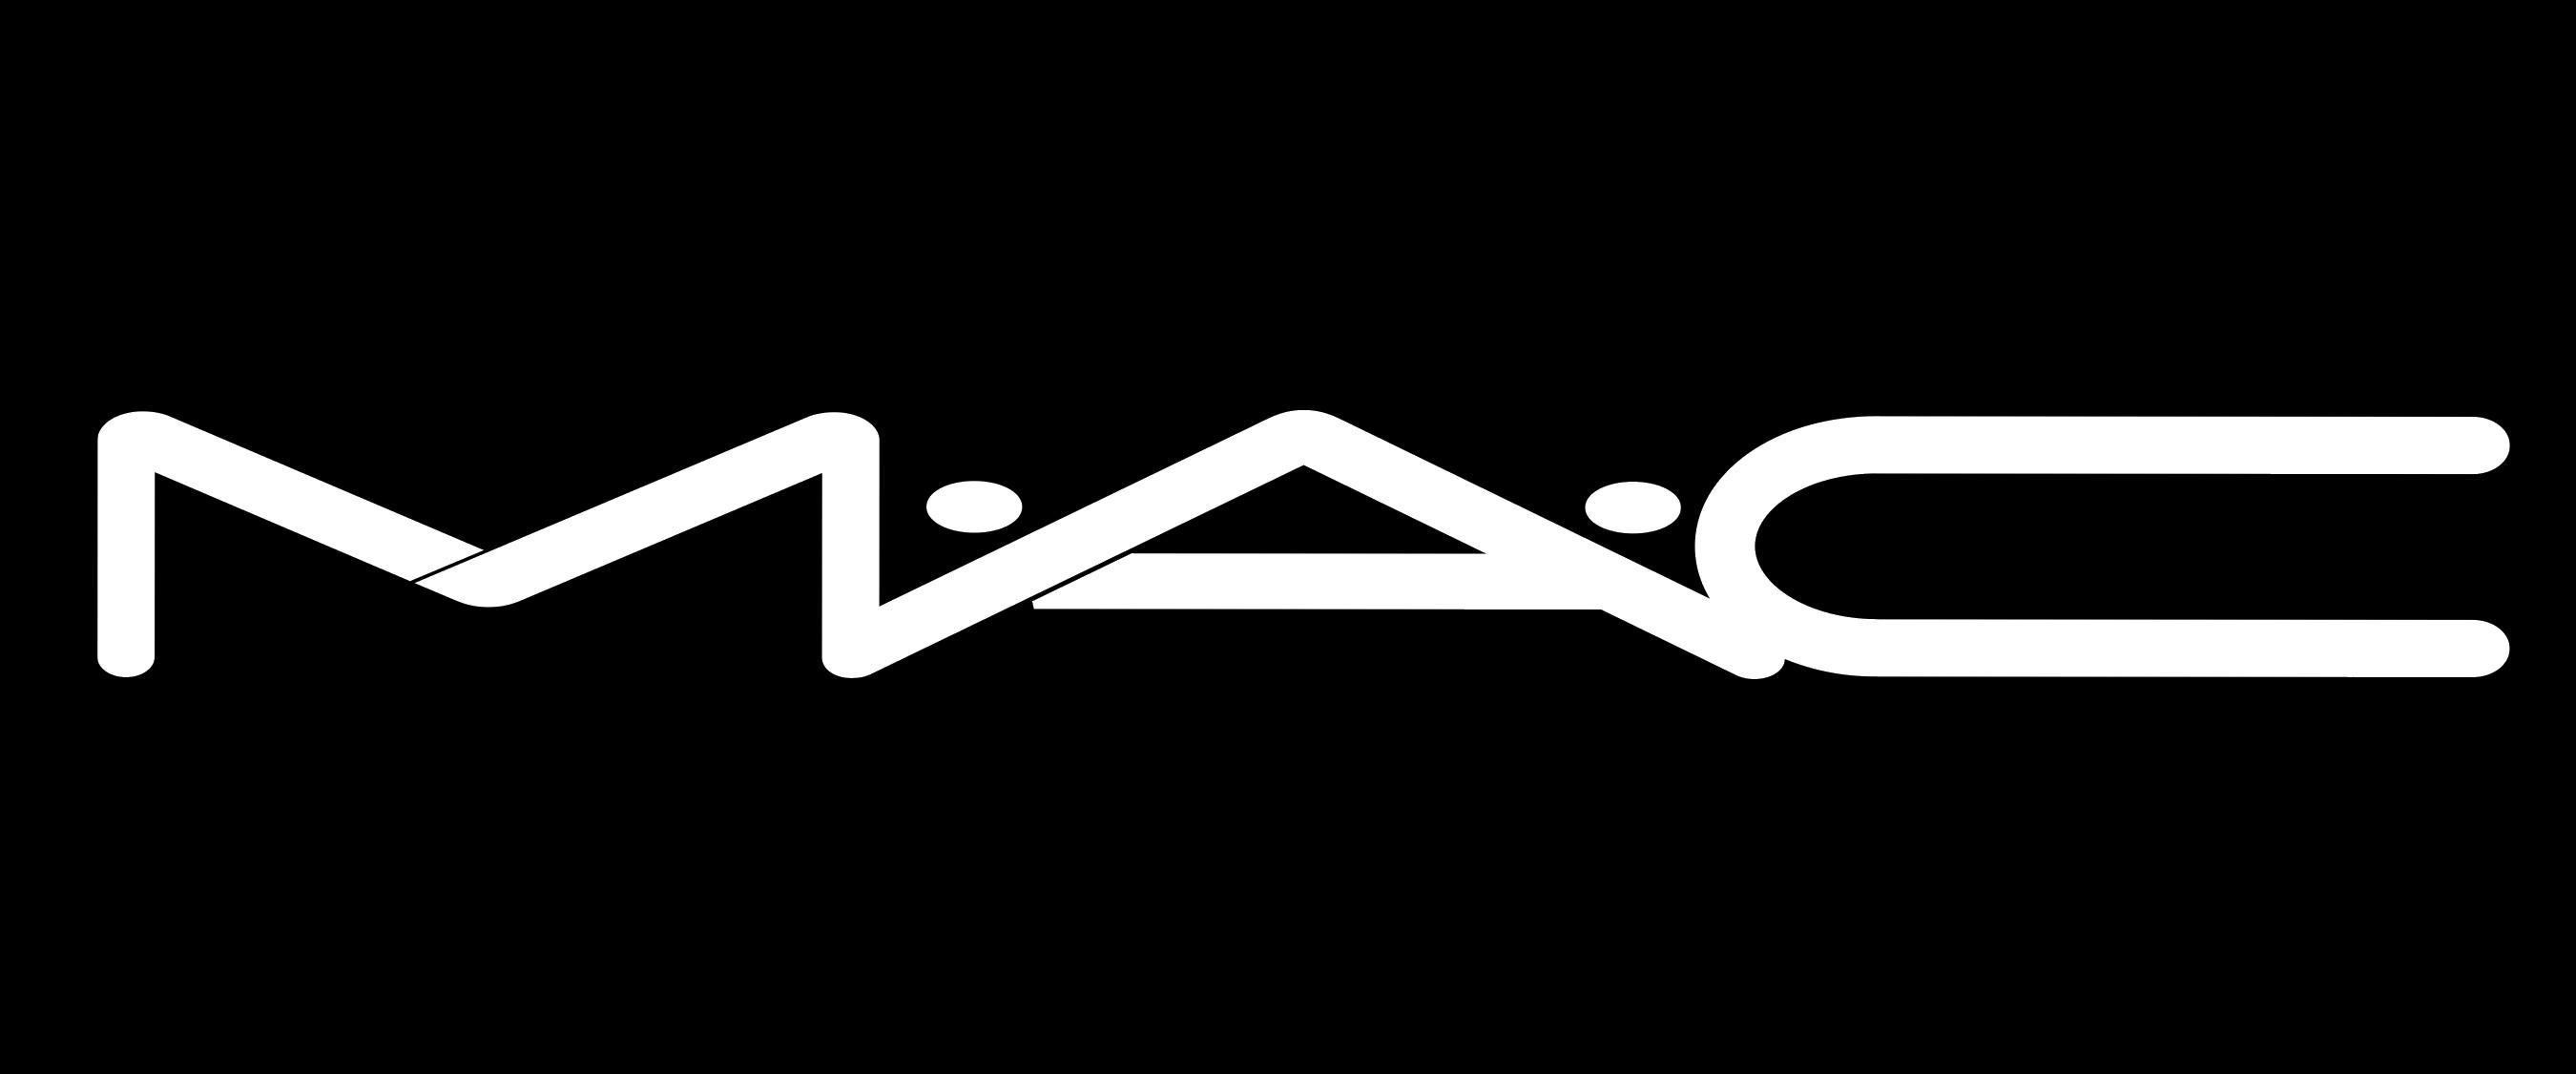 la storia di mac cosmetics m a c logo black mac …